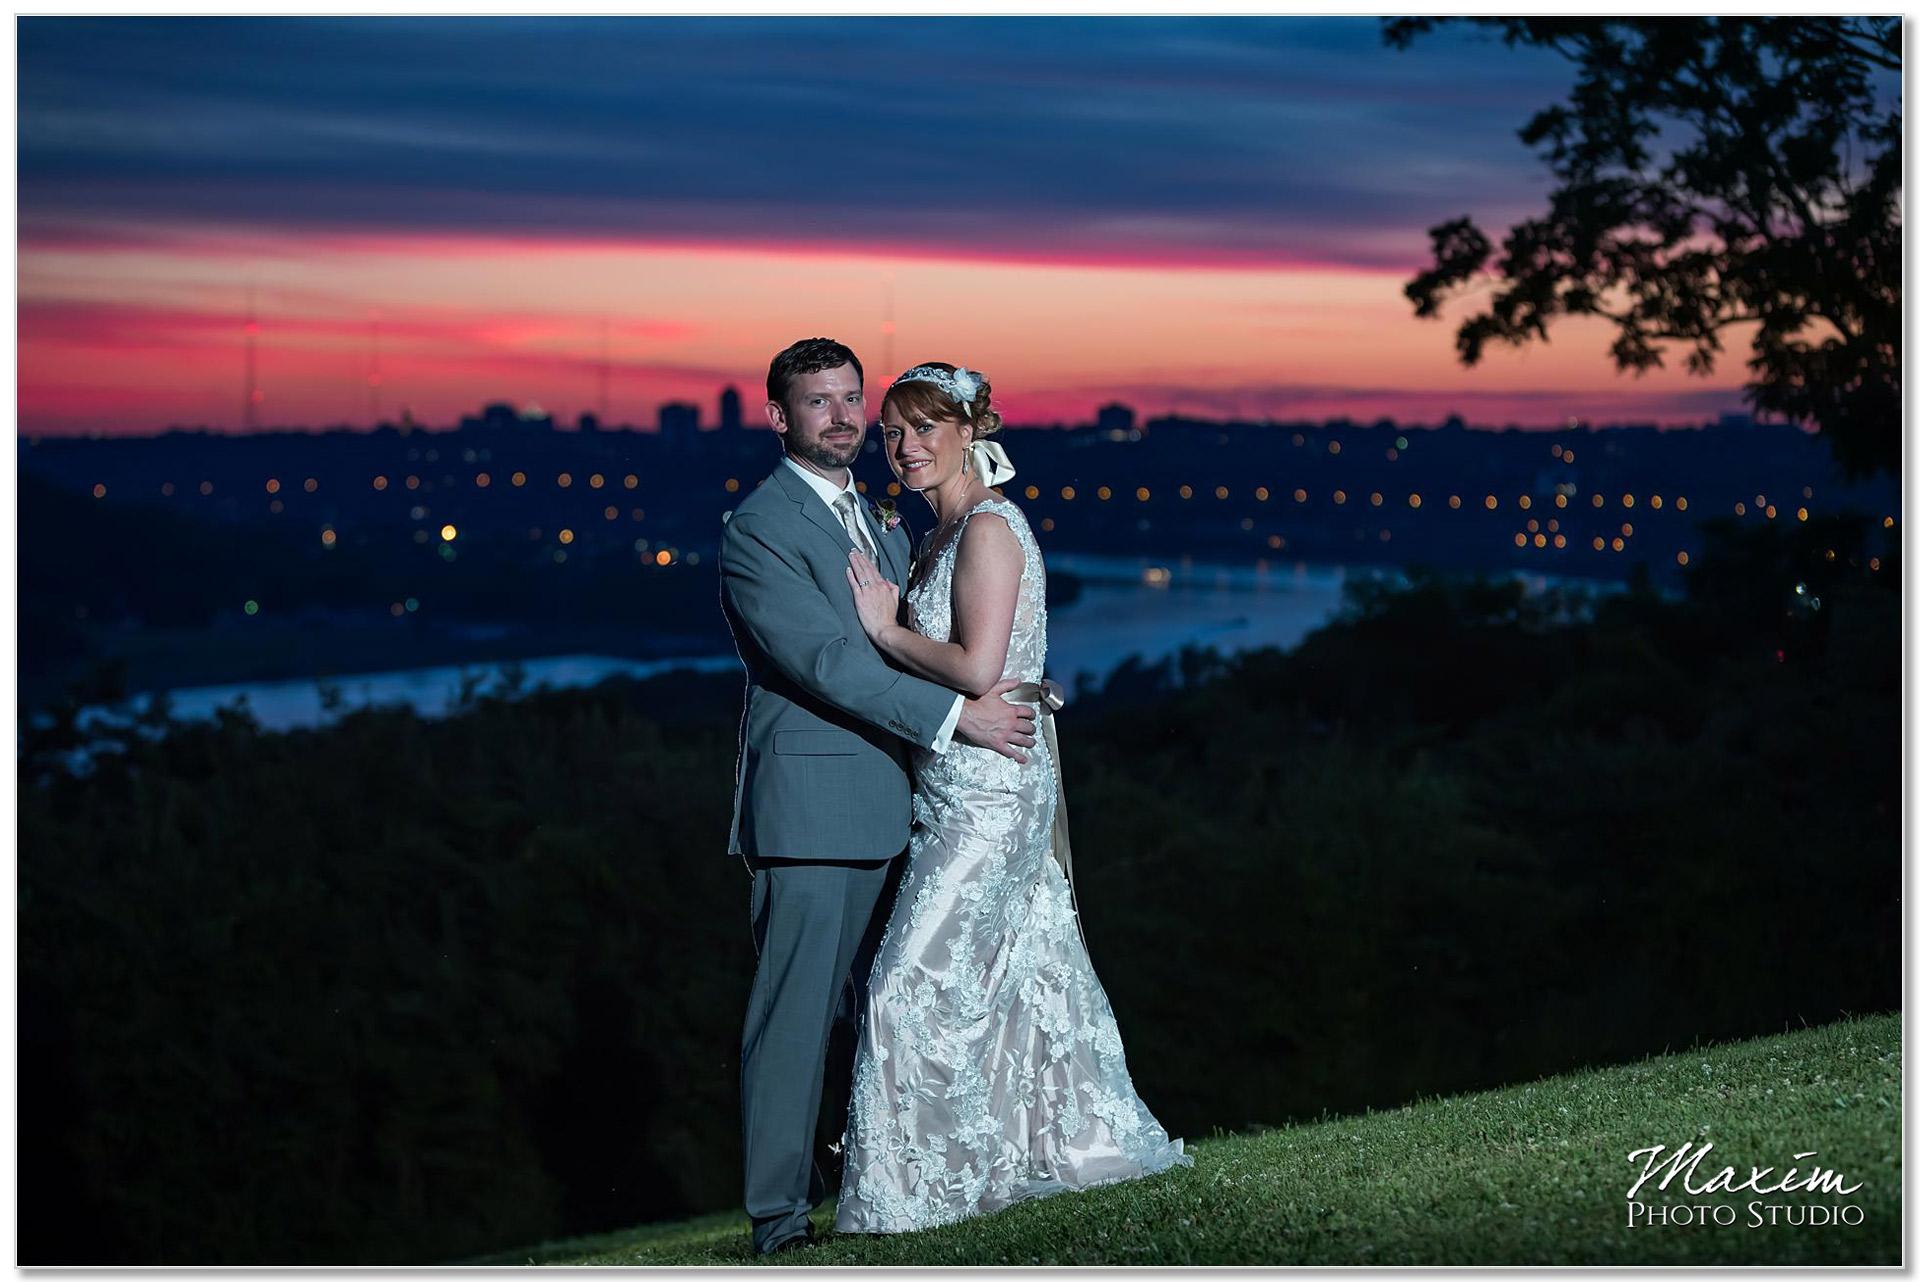 Alms Park Sunset Cincinnati wedding skyline